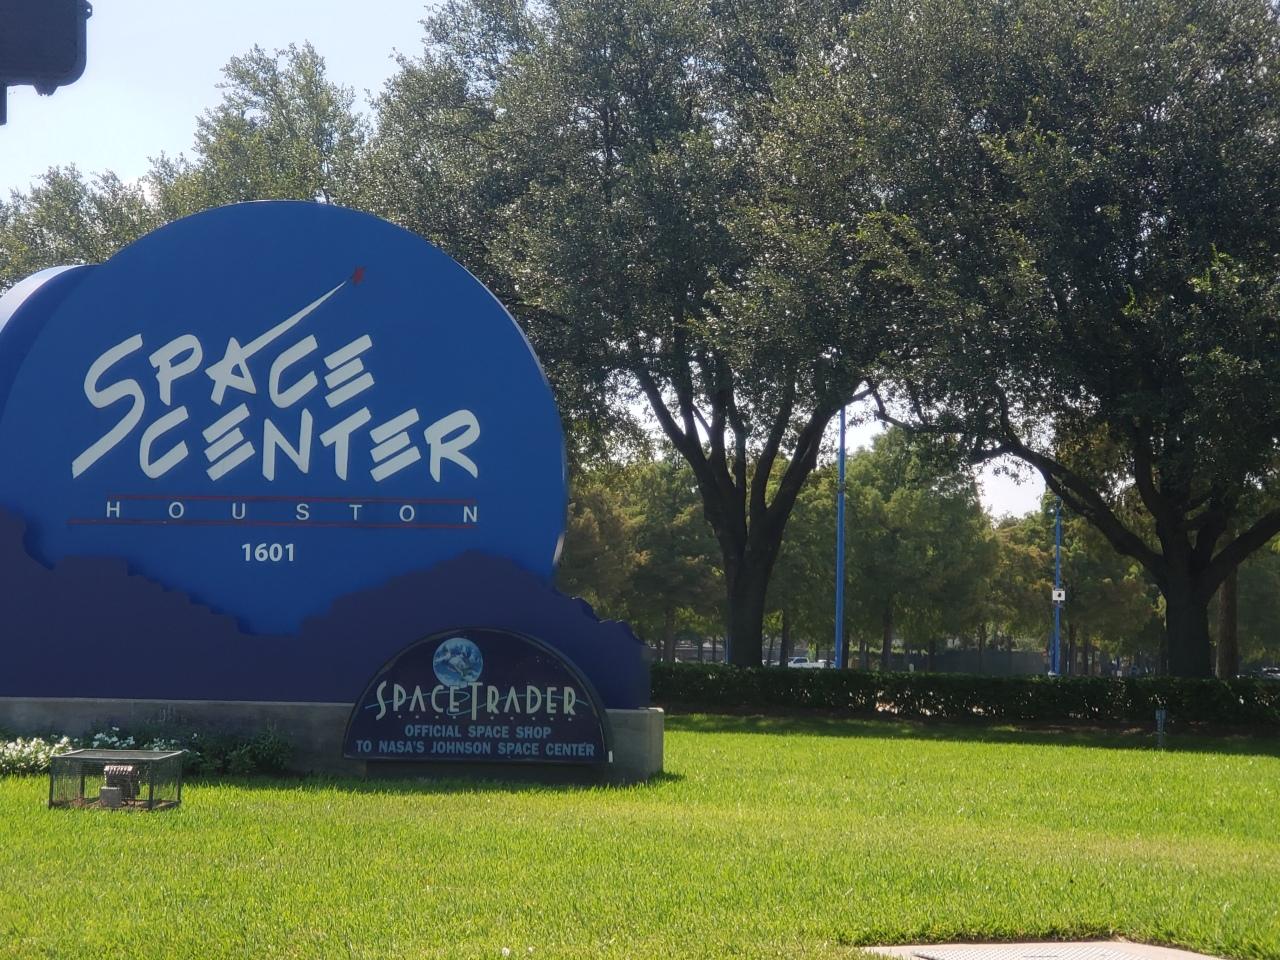 NASA Space Center in Houston,Texas